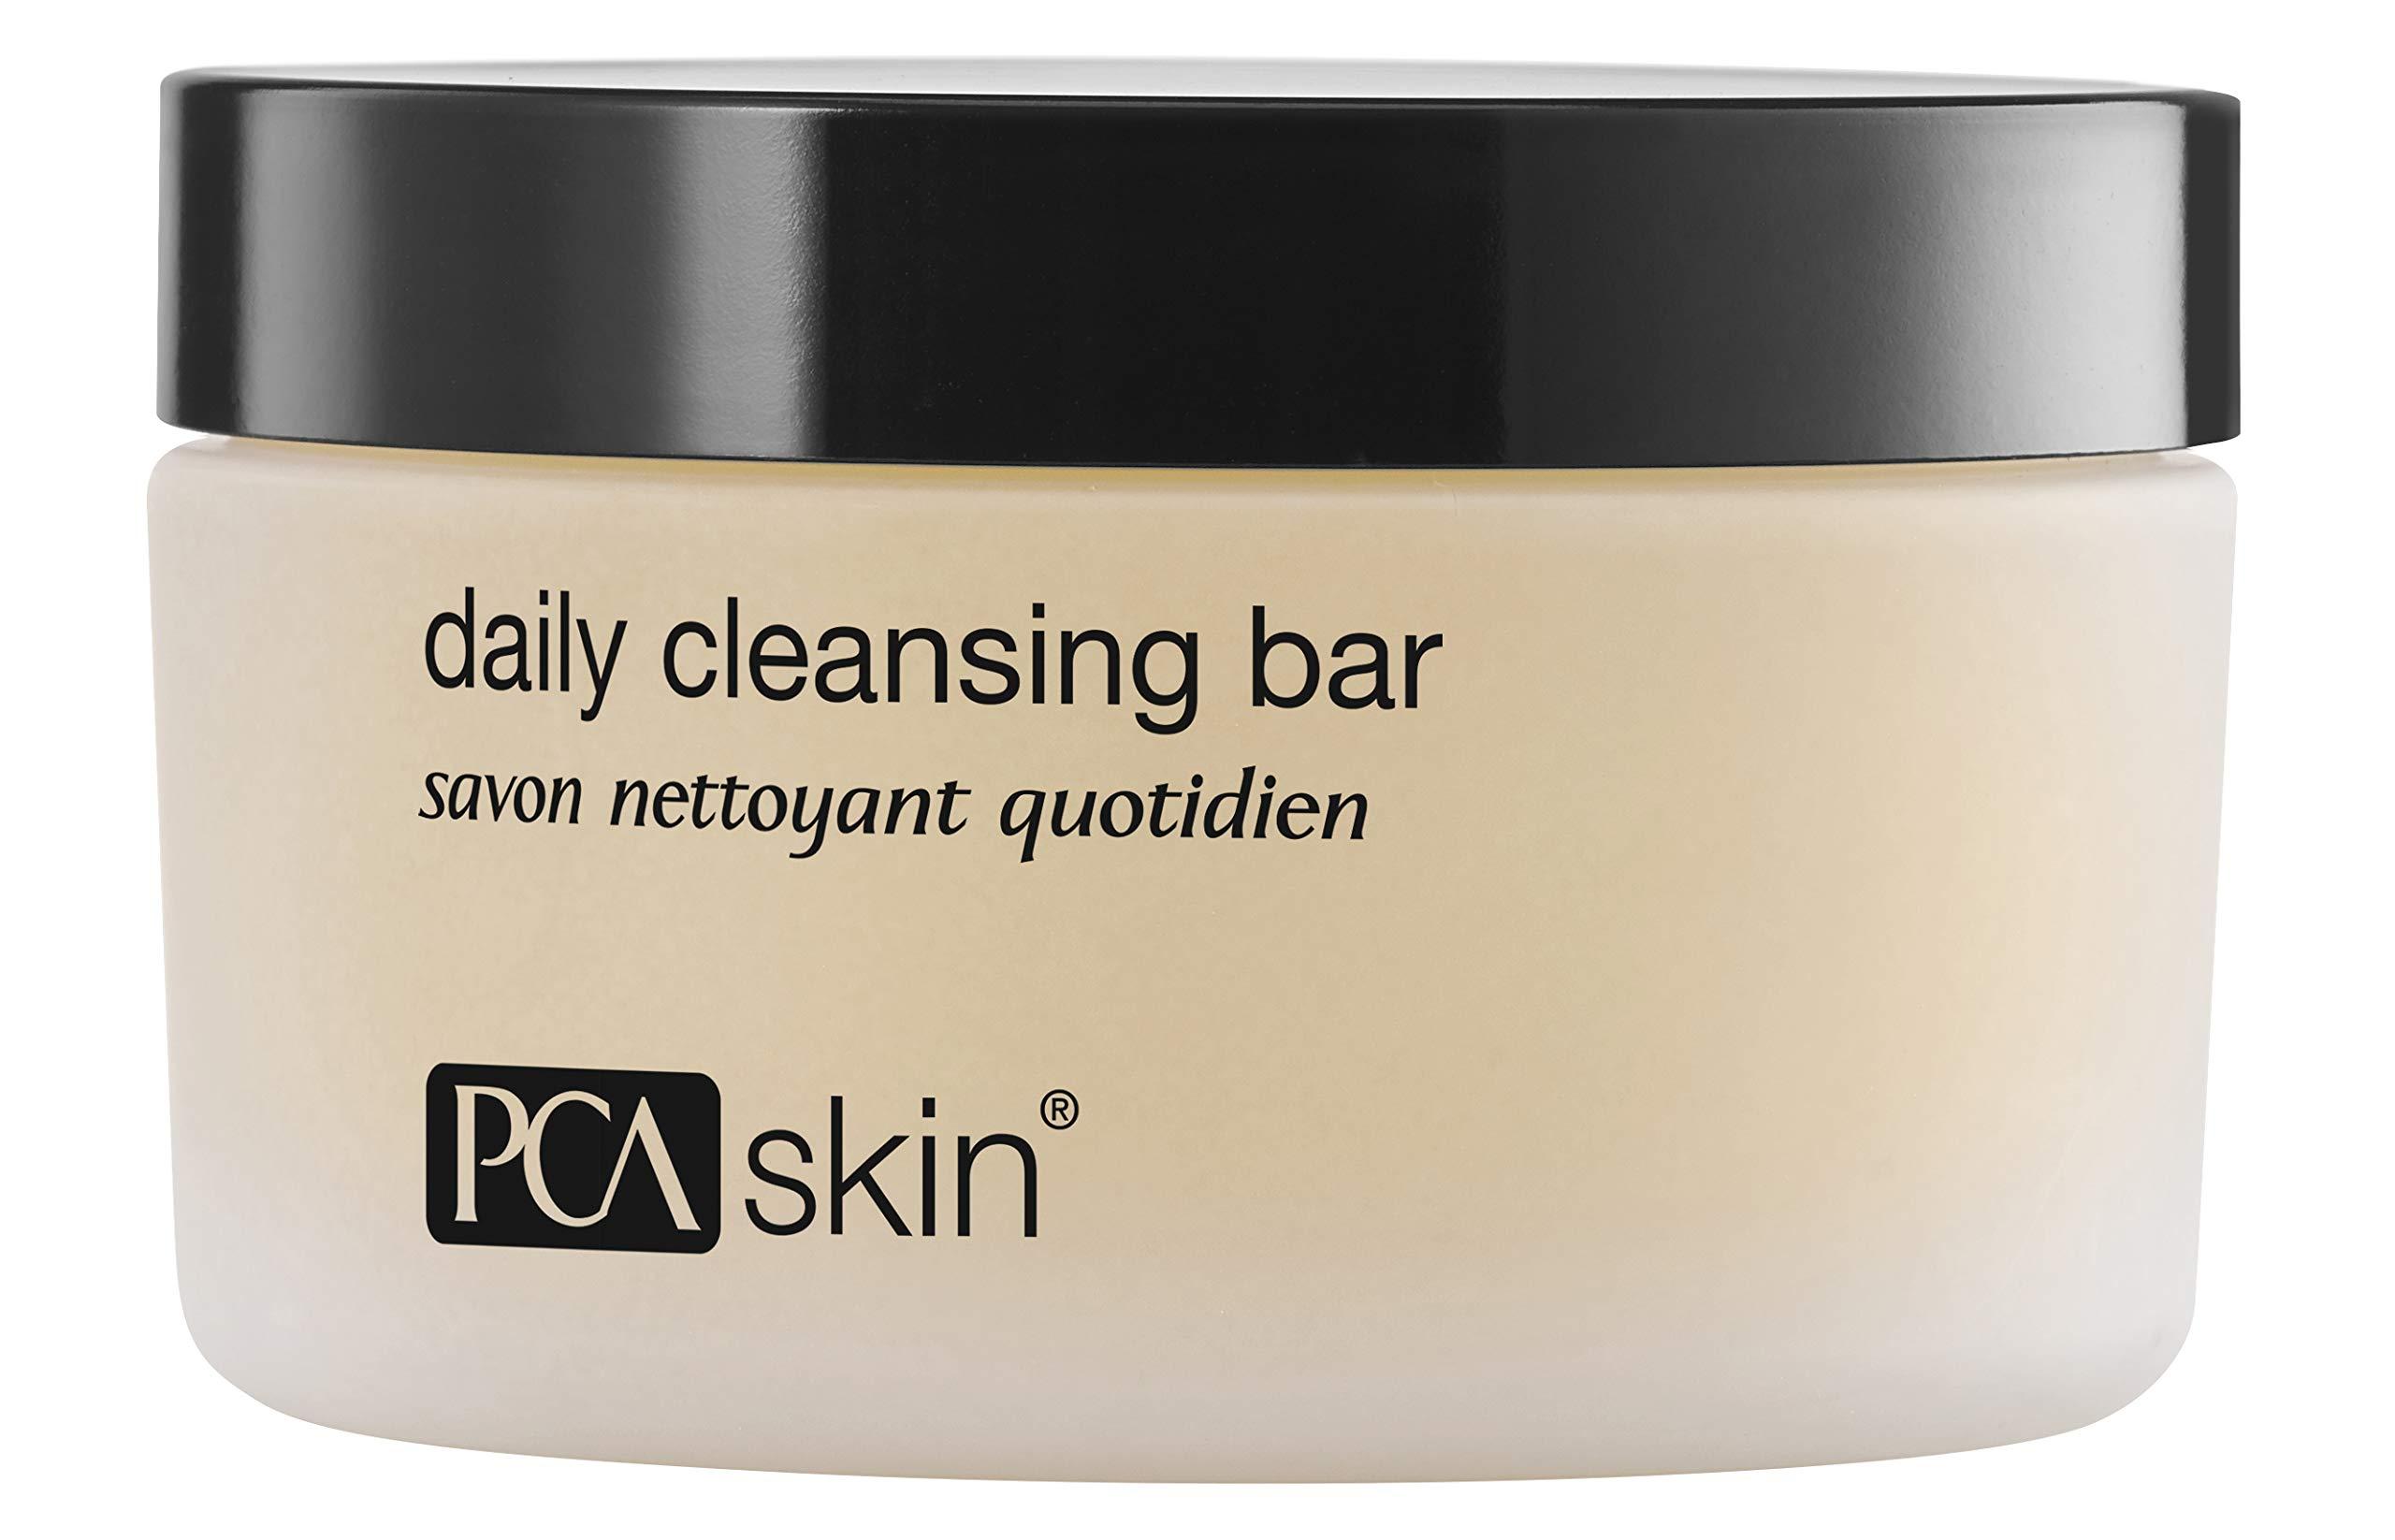 PCA SKIN Daily Cleansing Bar, 3 Oz